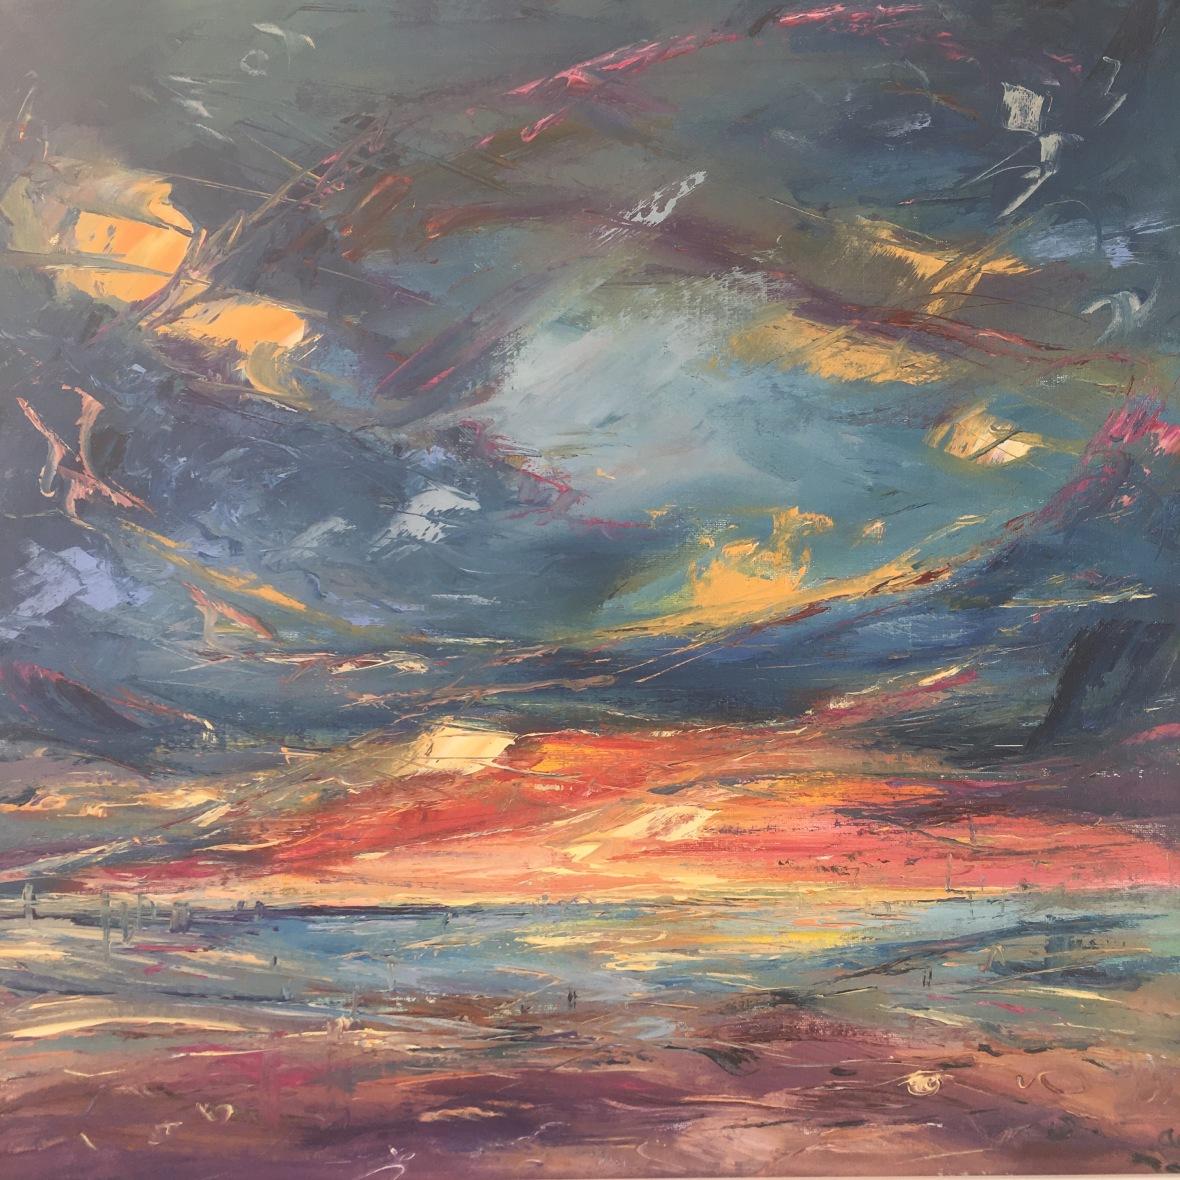 Time flies romantic seascape sunset oilpaintingAnna Cumming